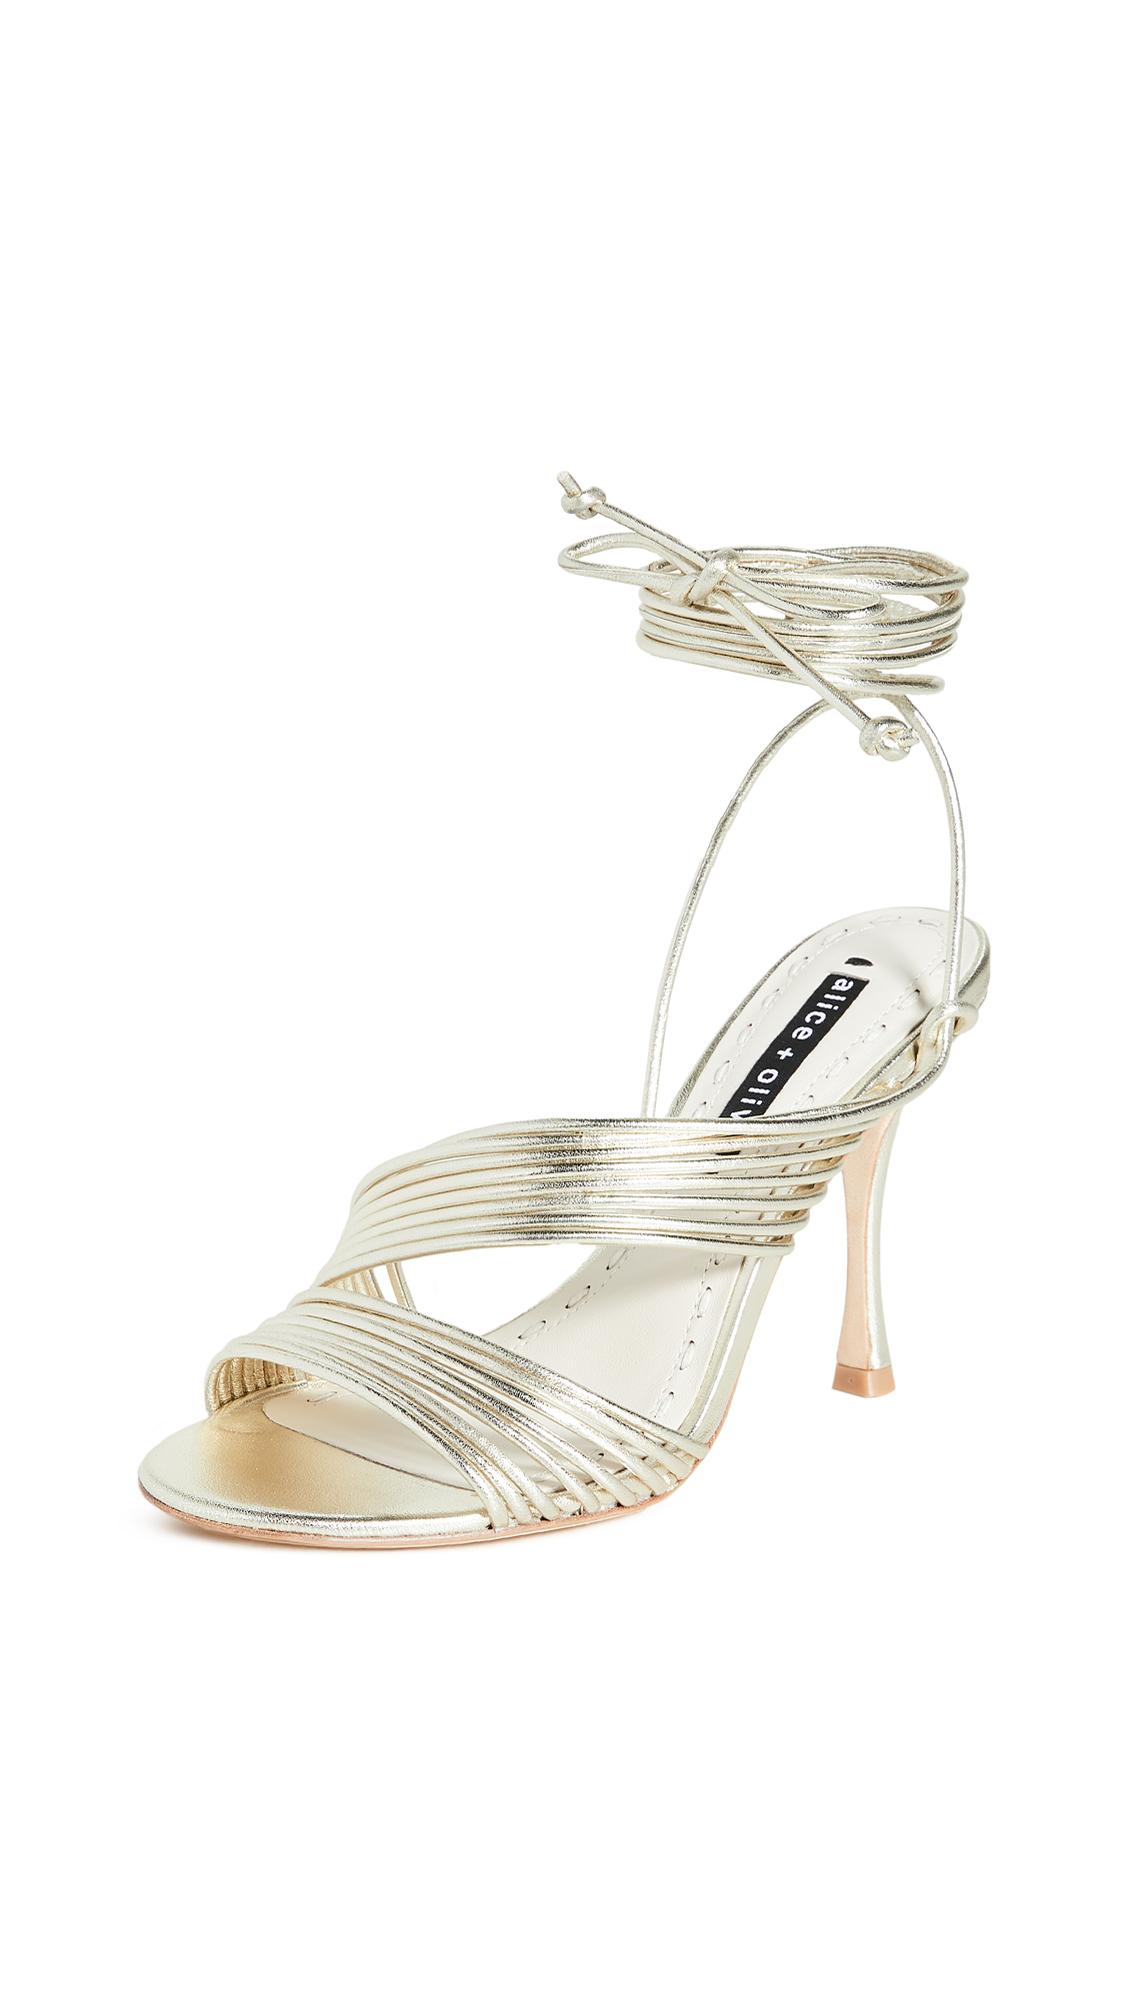 Buy alice + olivia Danessa Sandals online, shop alice + olivia